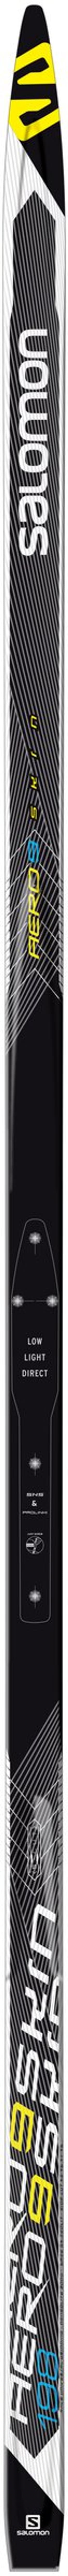 Aero 9 Skin inkl. Prolink Pro Classic